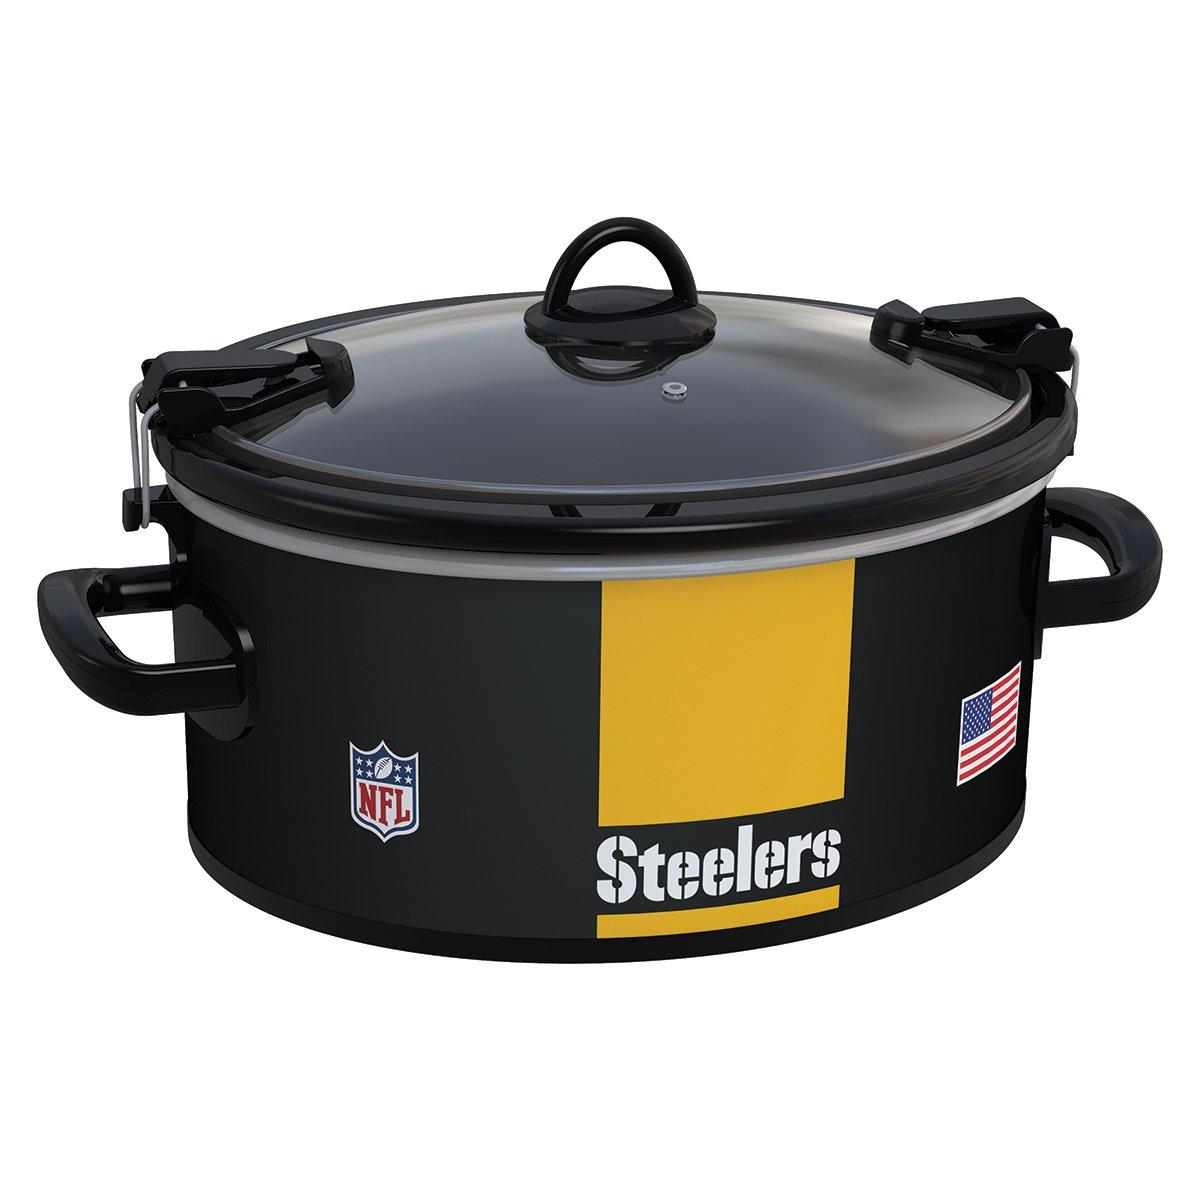 61ZQBNtk9zL._SL1200_ amazon com crock pot pittsburgh steelers nfl 6 quart cook & carry